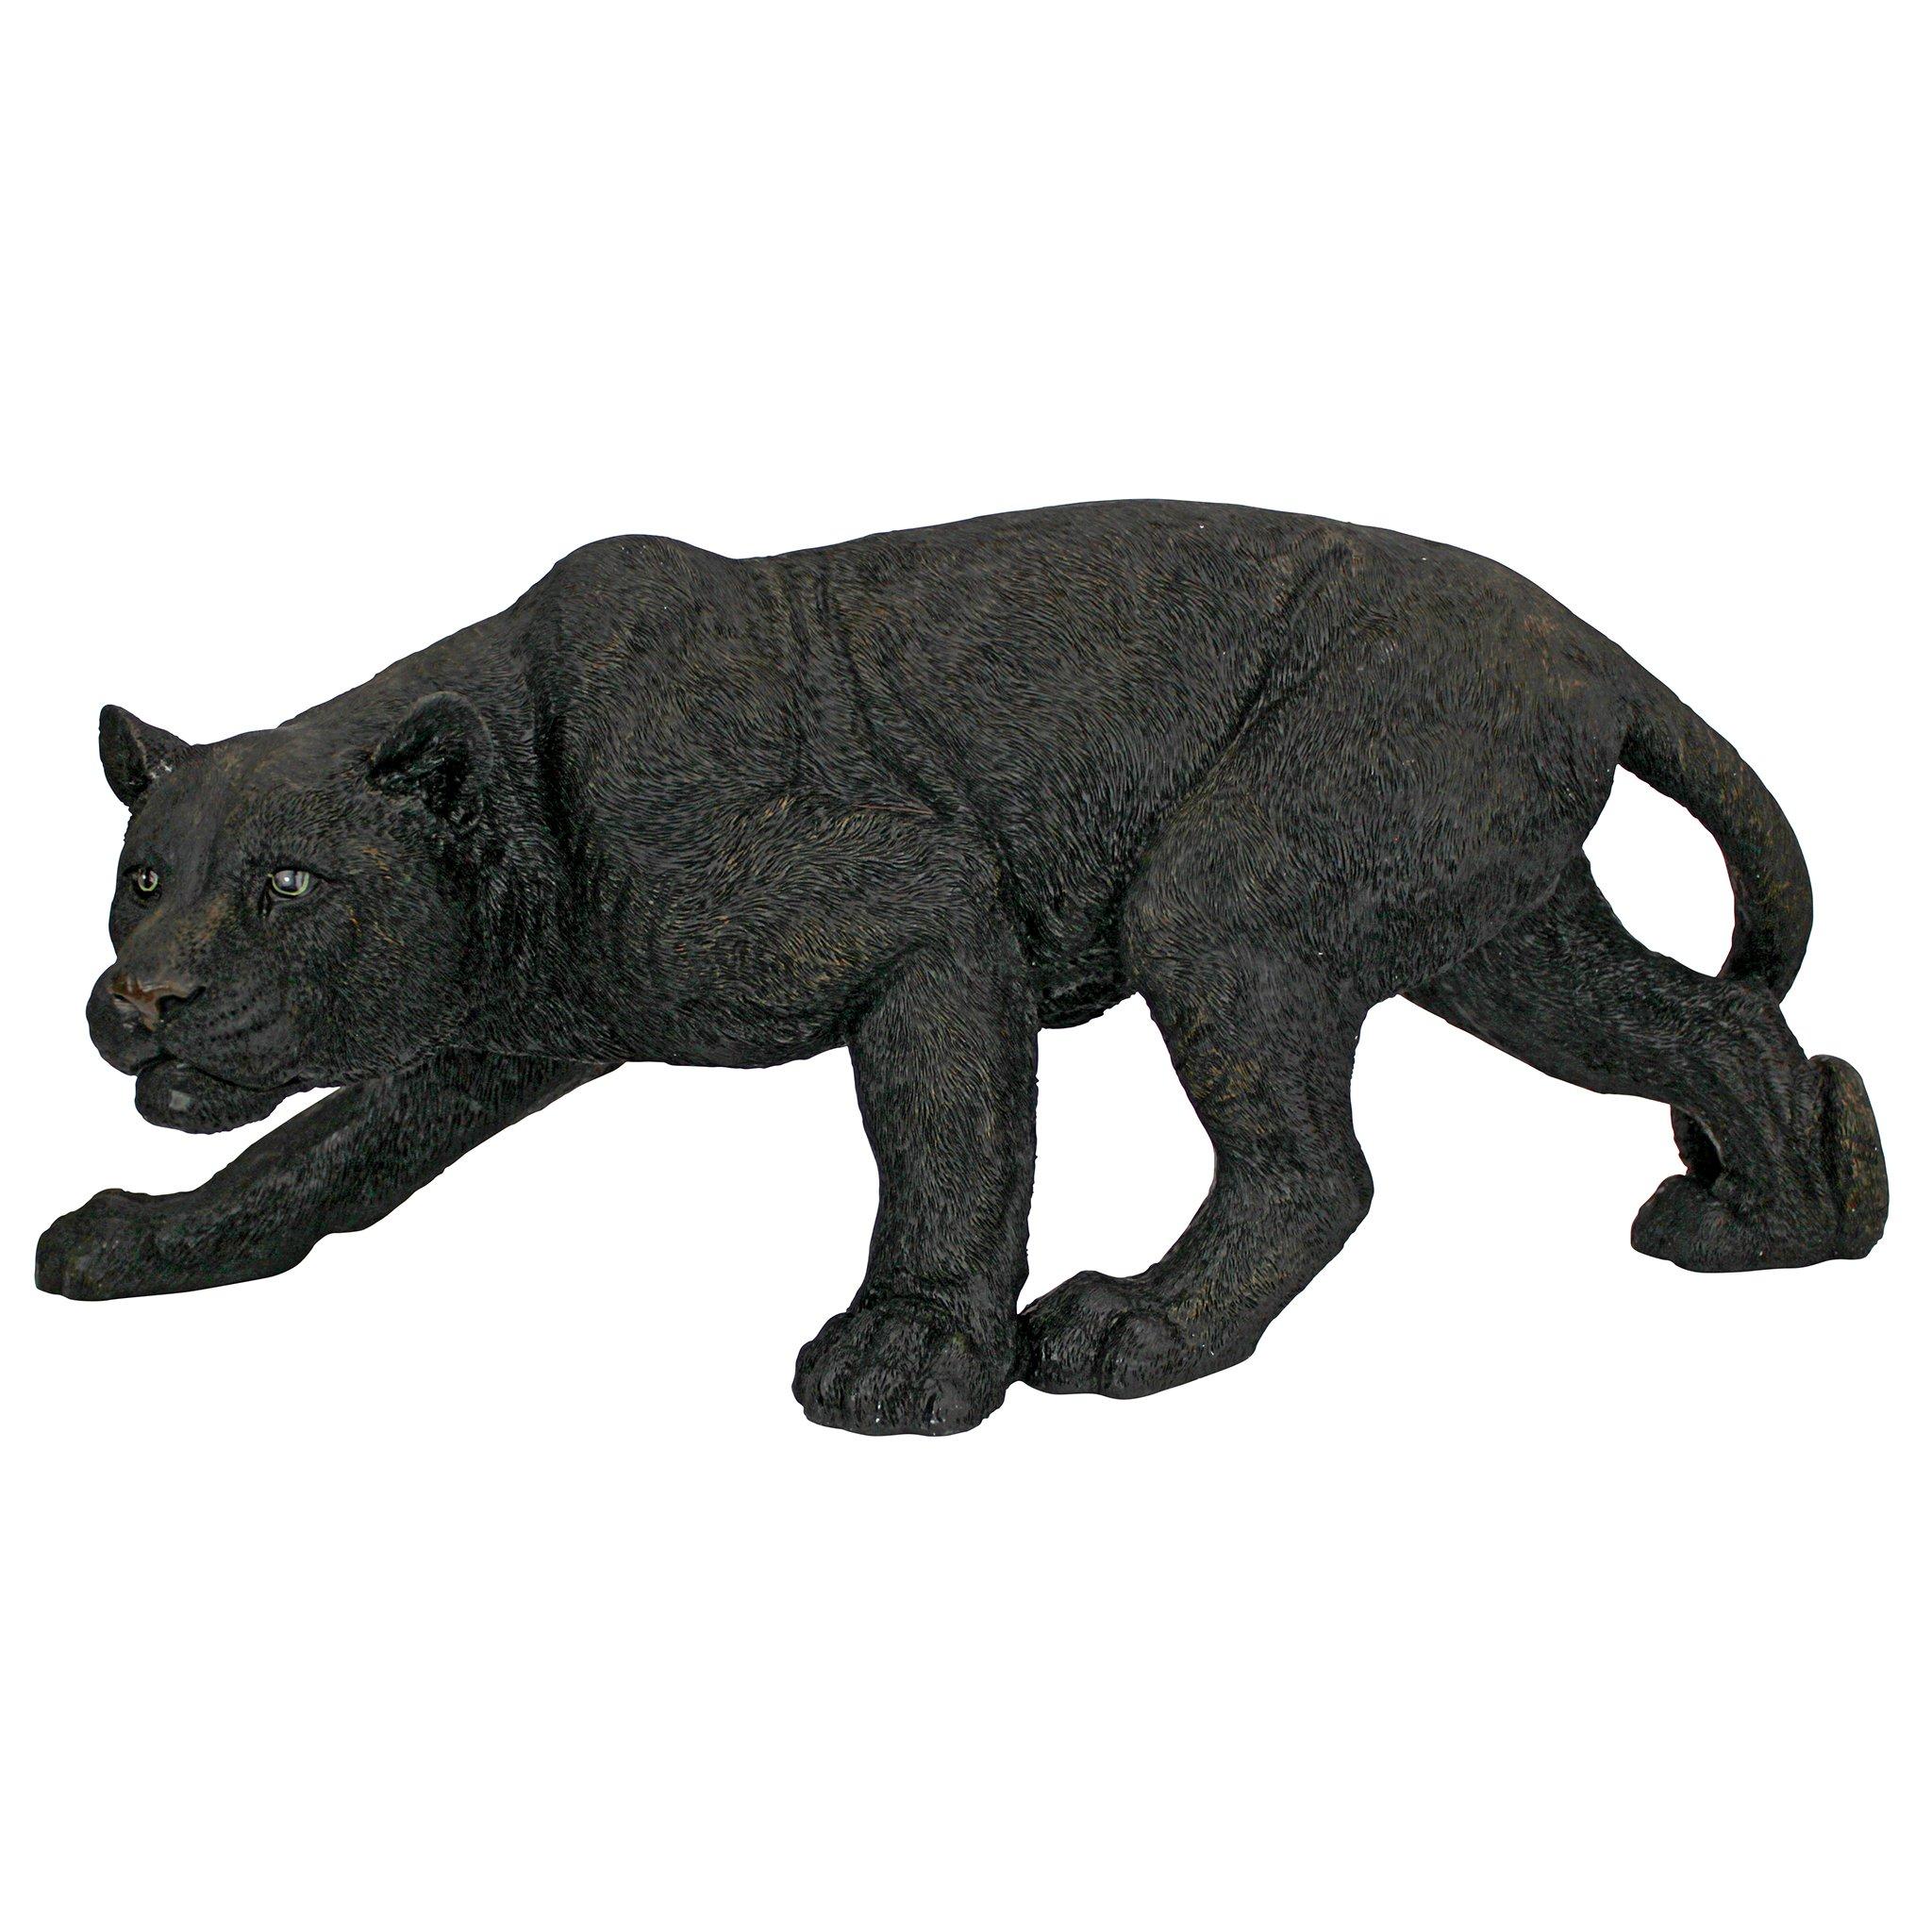 Design Toscano Shadowed Predator Black Panther Garden Statue by Design Toscano